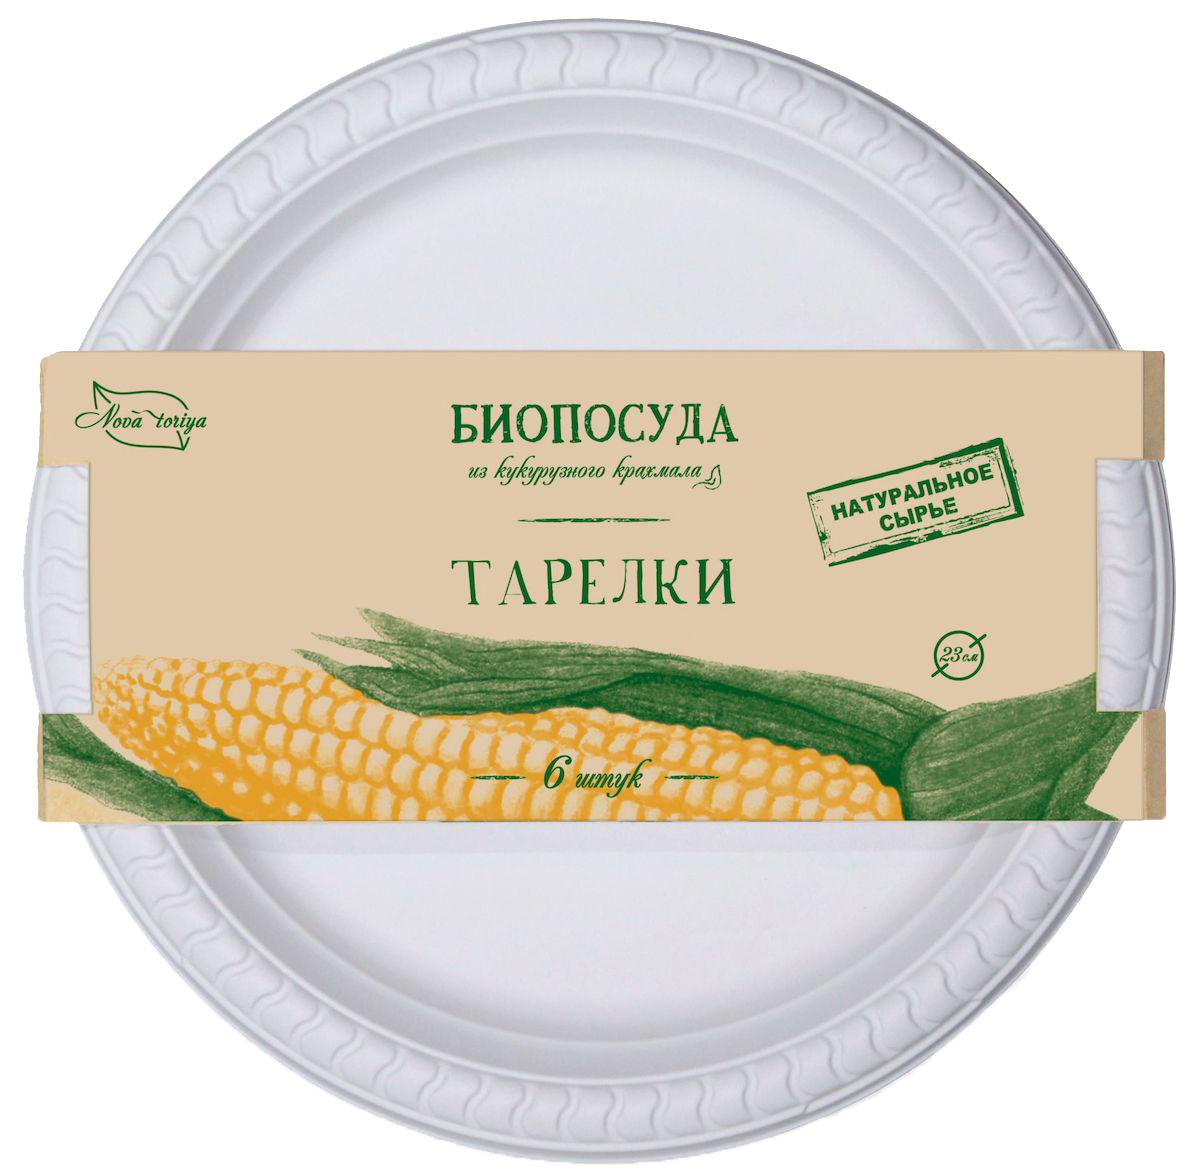 Набор одноразовых тарелок